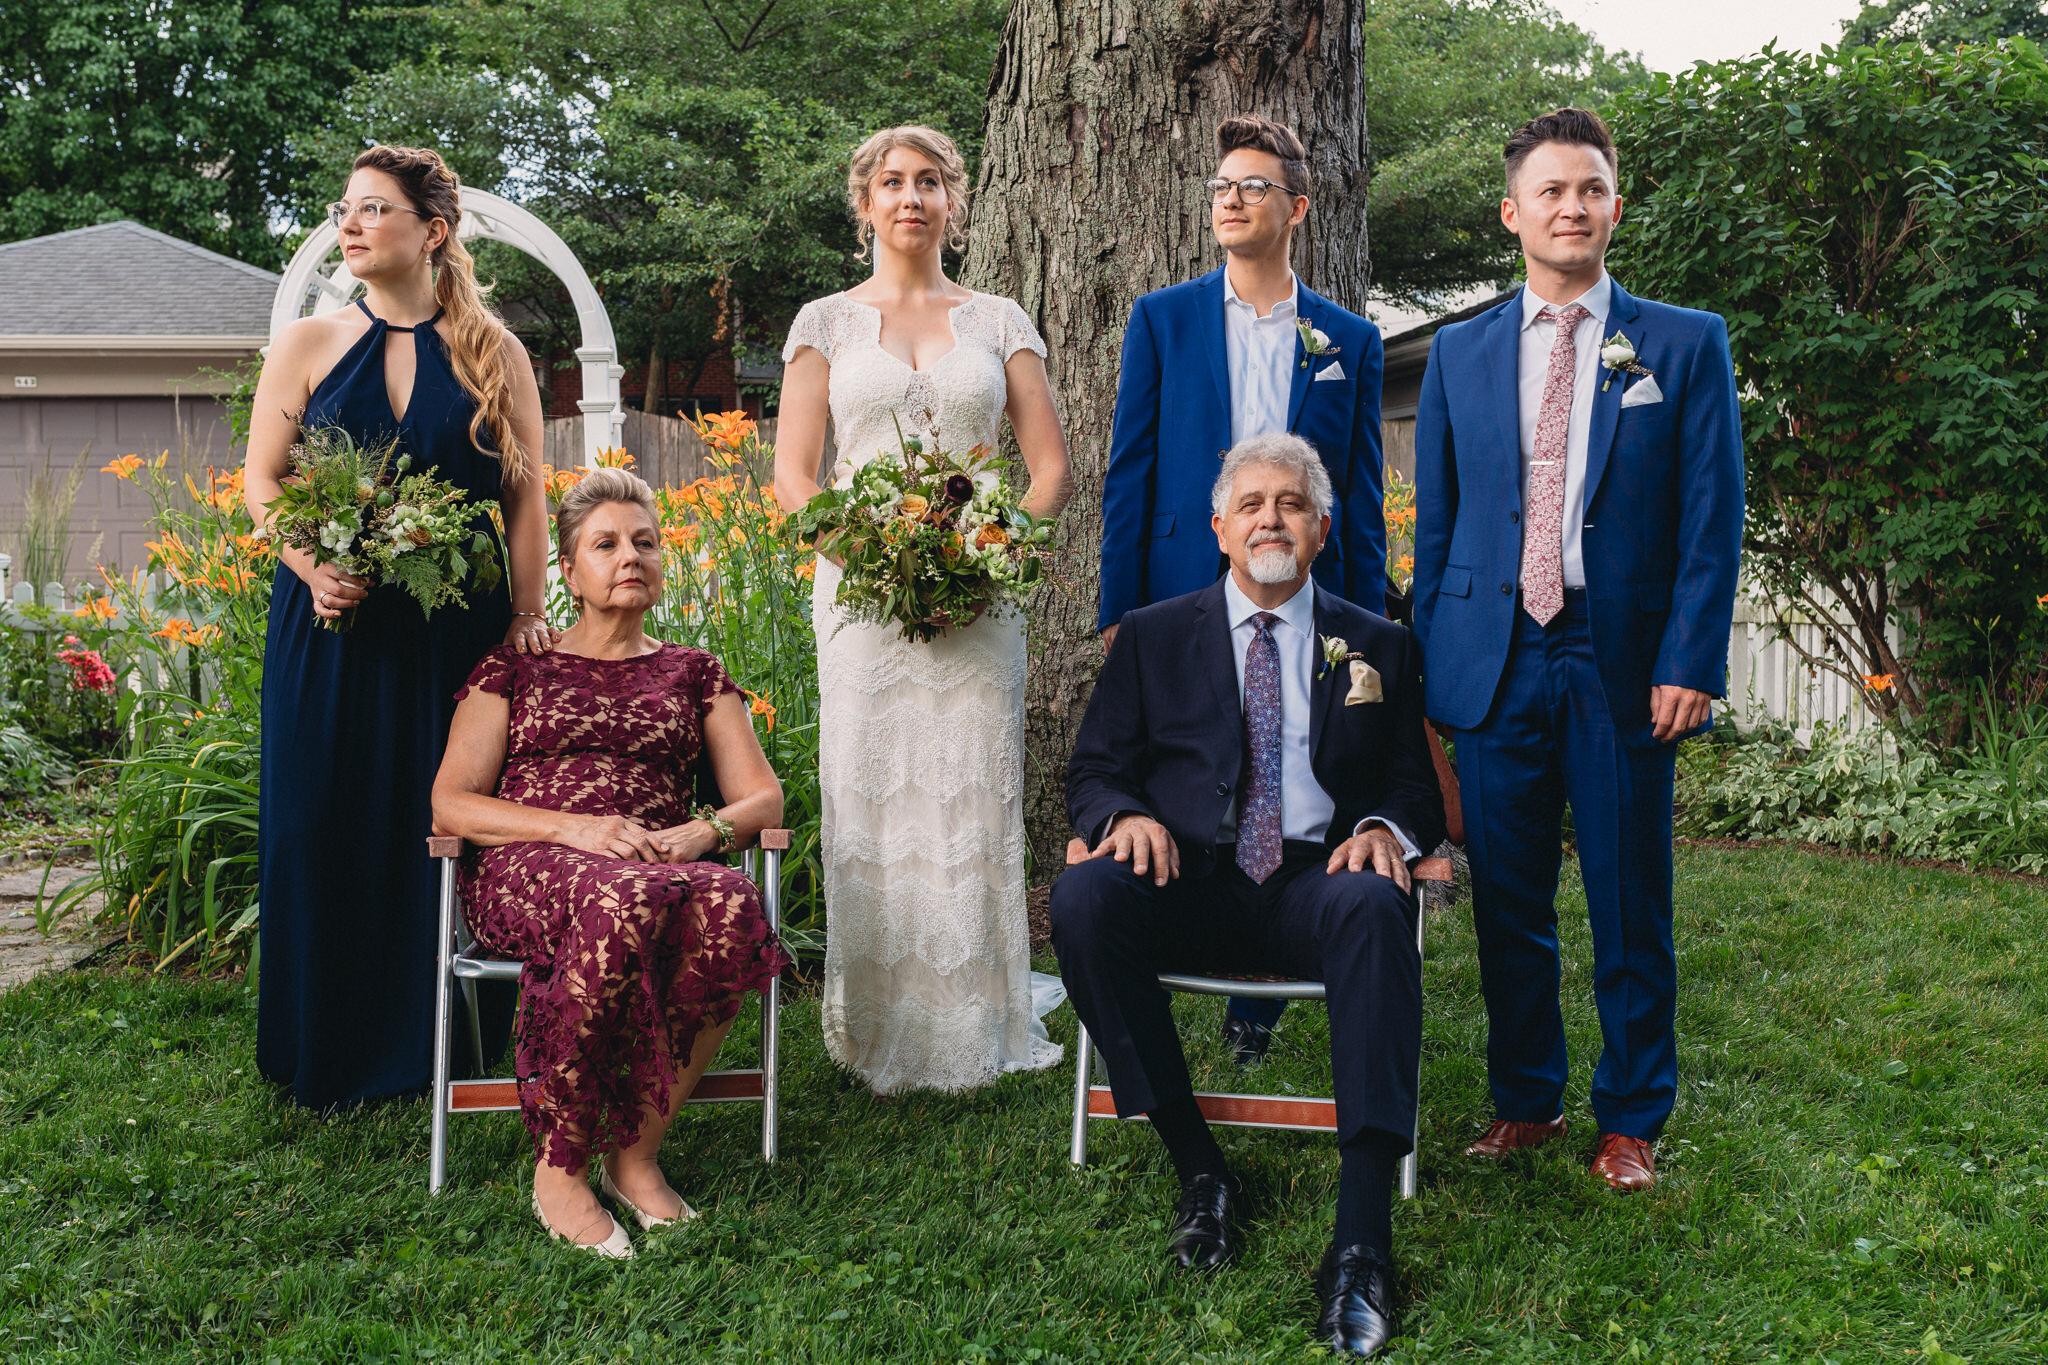 chicago-oak-park-wedding-rebeccaylasotras-11.jpg